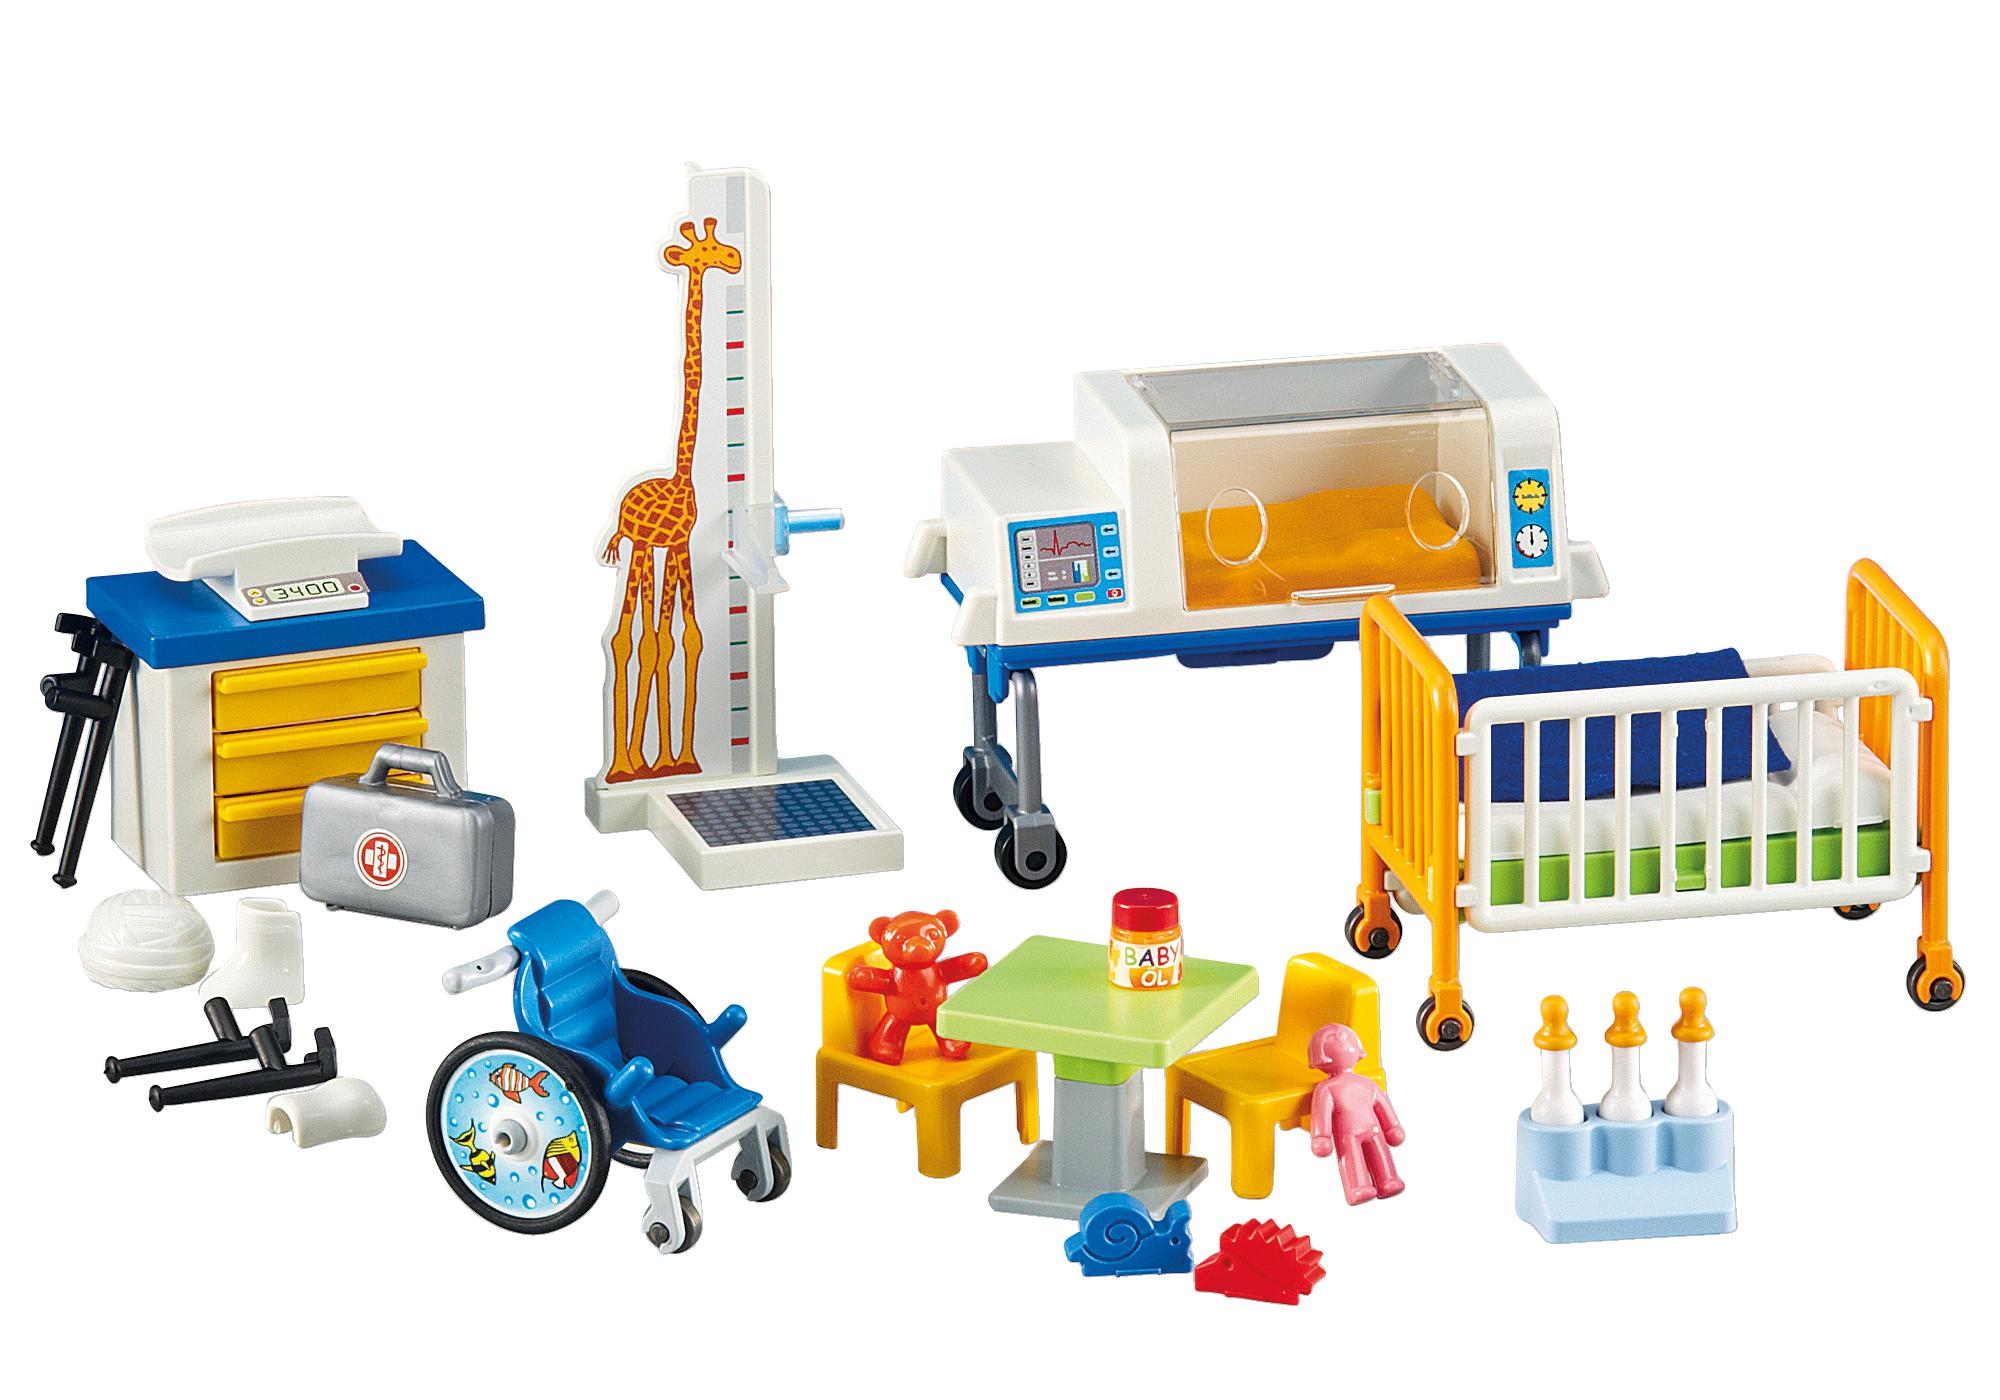 http://media.playmobil.com/i/playmobil/6295_product_detail/Children`s Medical Area